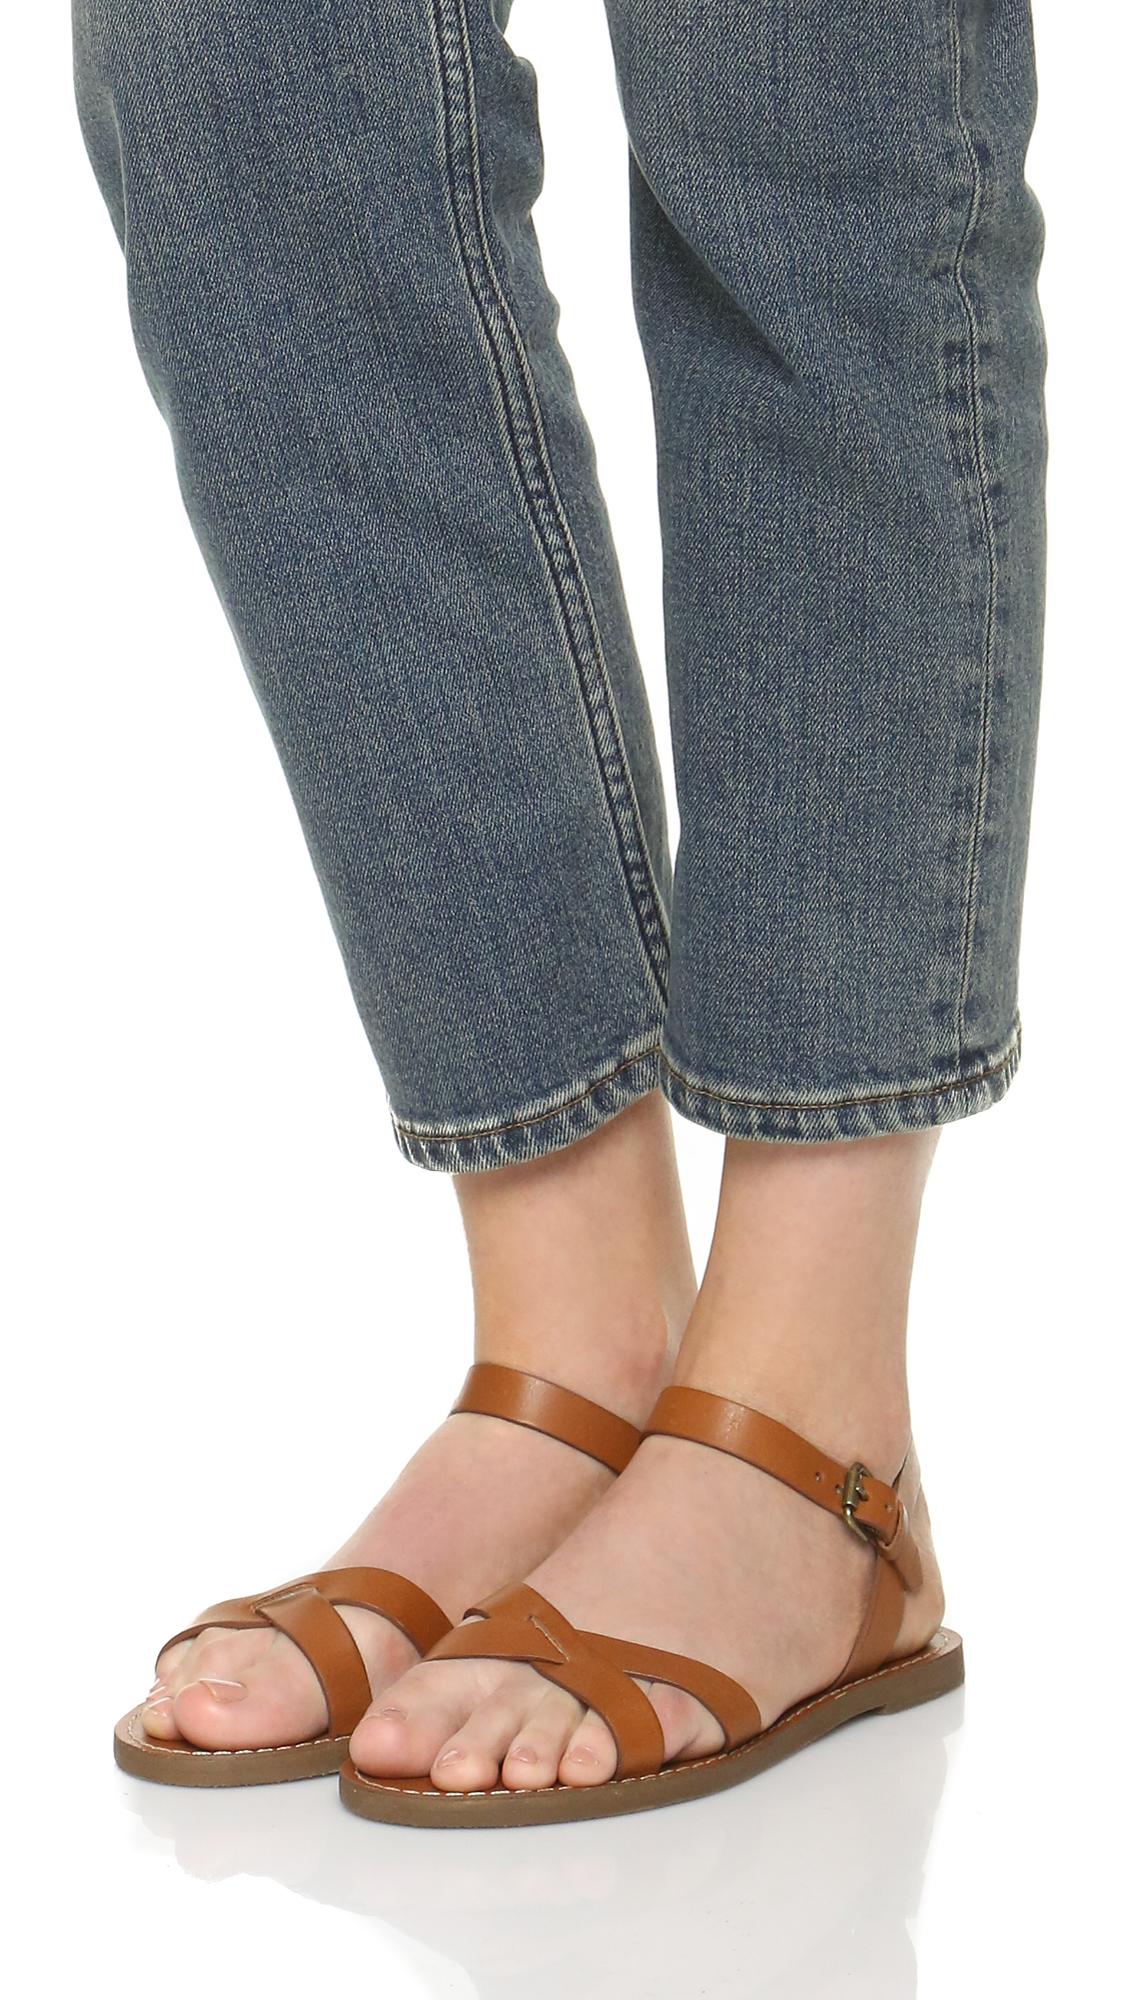 fe41630b6aeb Madewell Boardwalk Crisscross Sandals